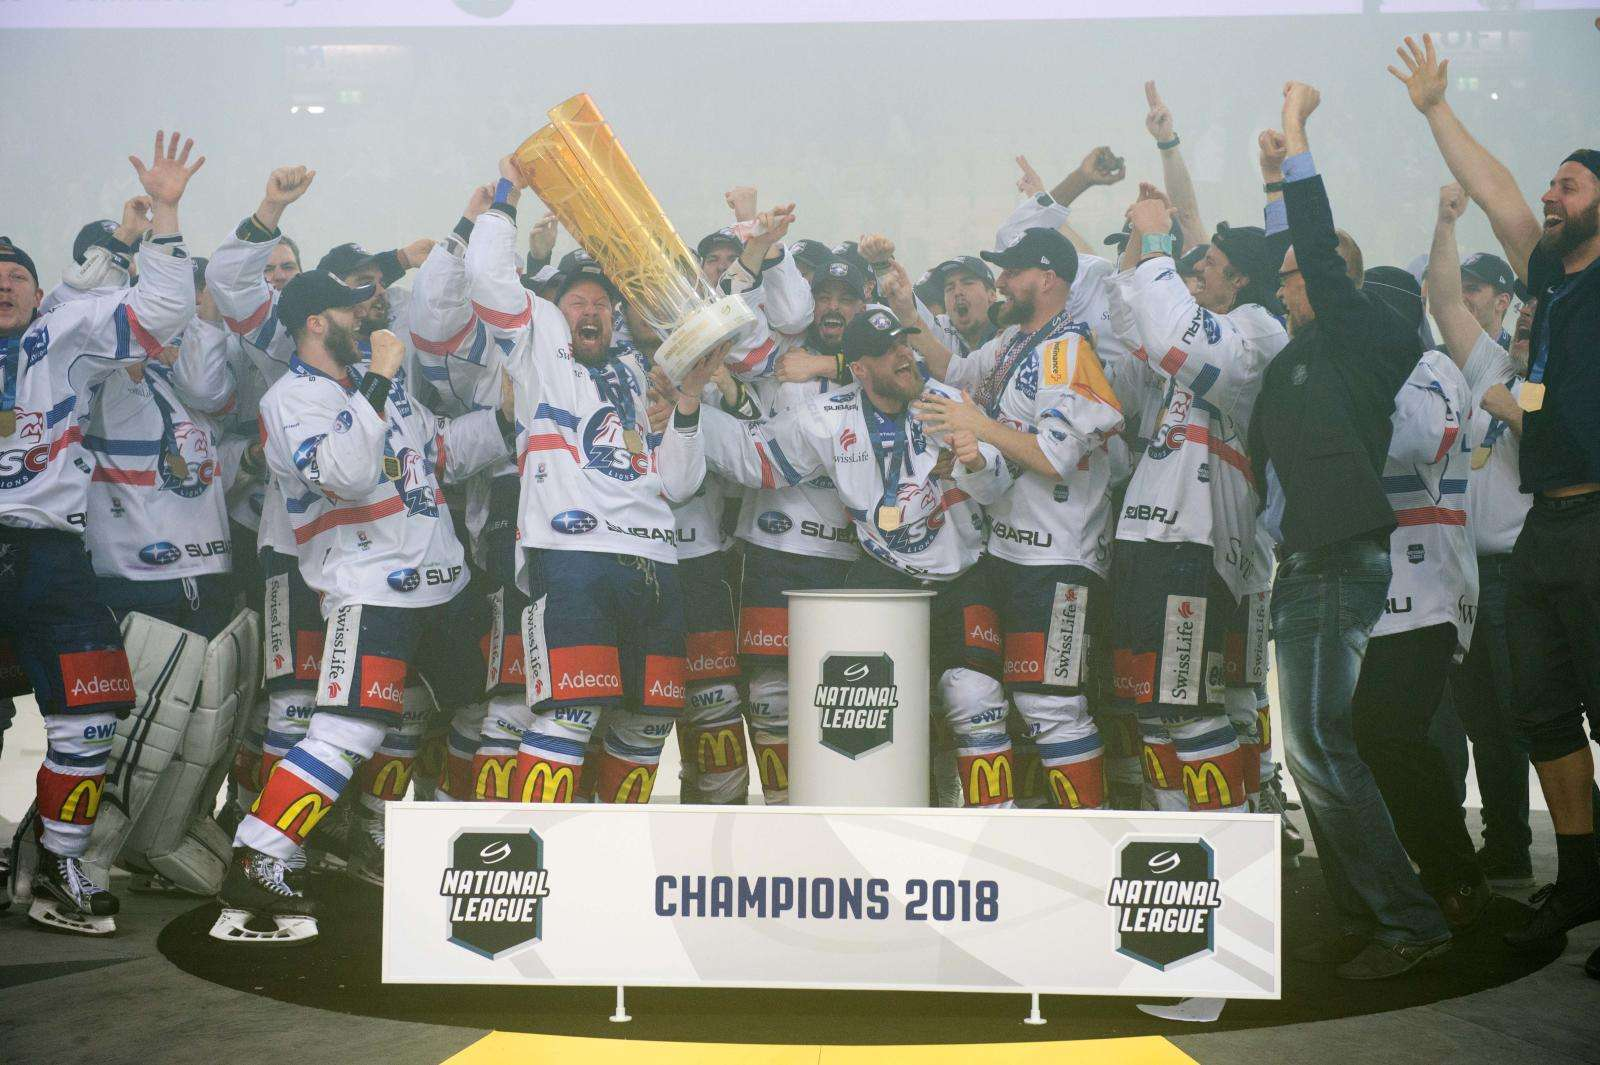 ZSC Champion.jpg